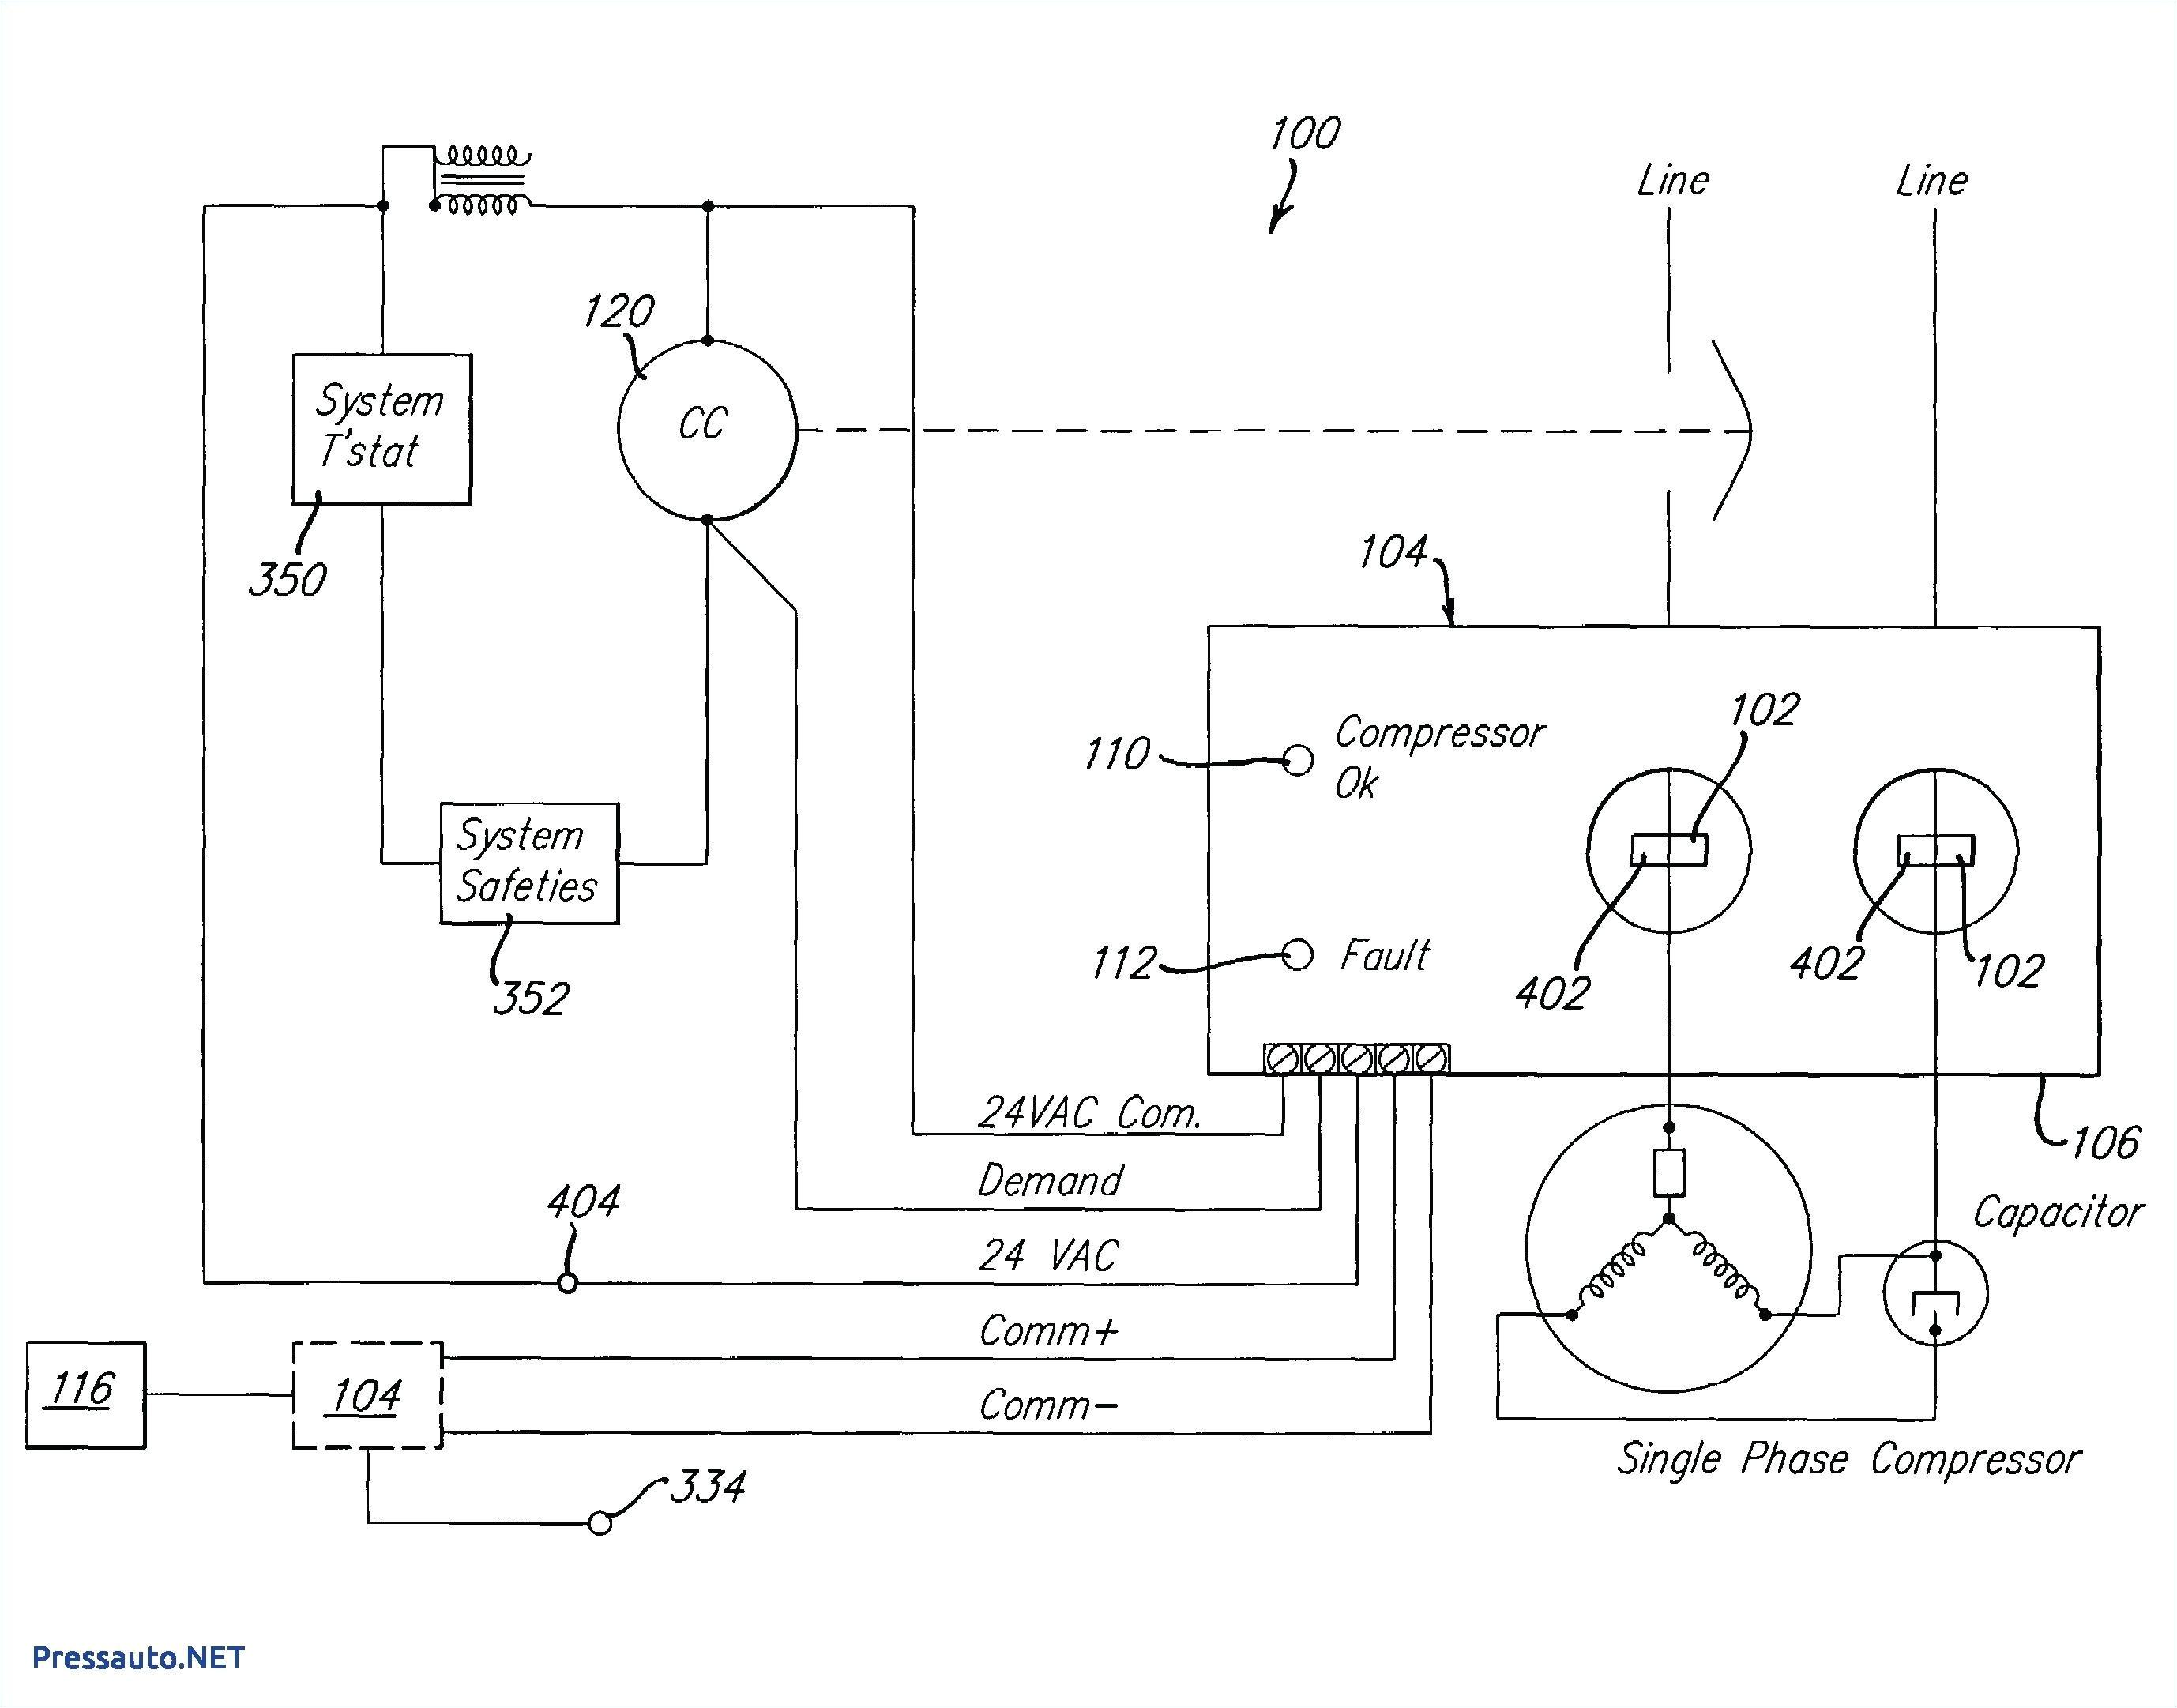 devilbiss wiring diagram wiring diagram operations devilbiss air compressor wiring diagram devilbiss wiring diagram